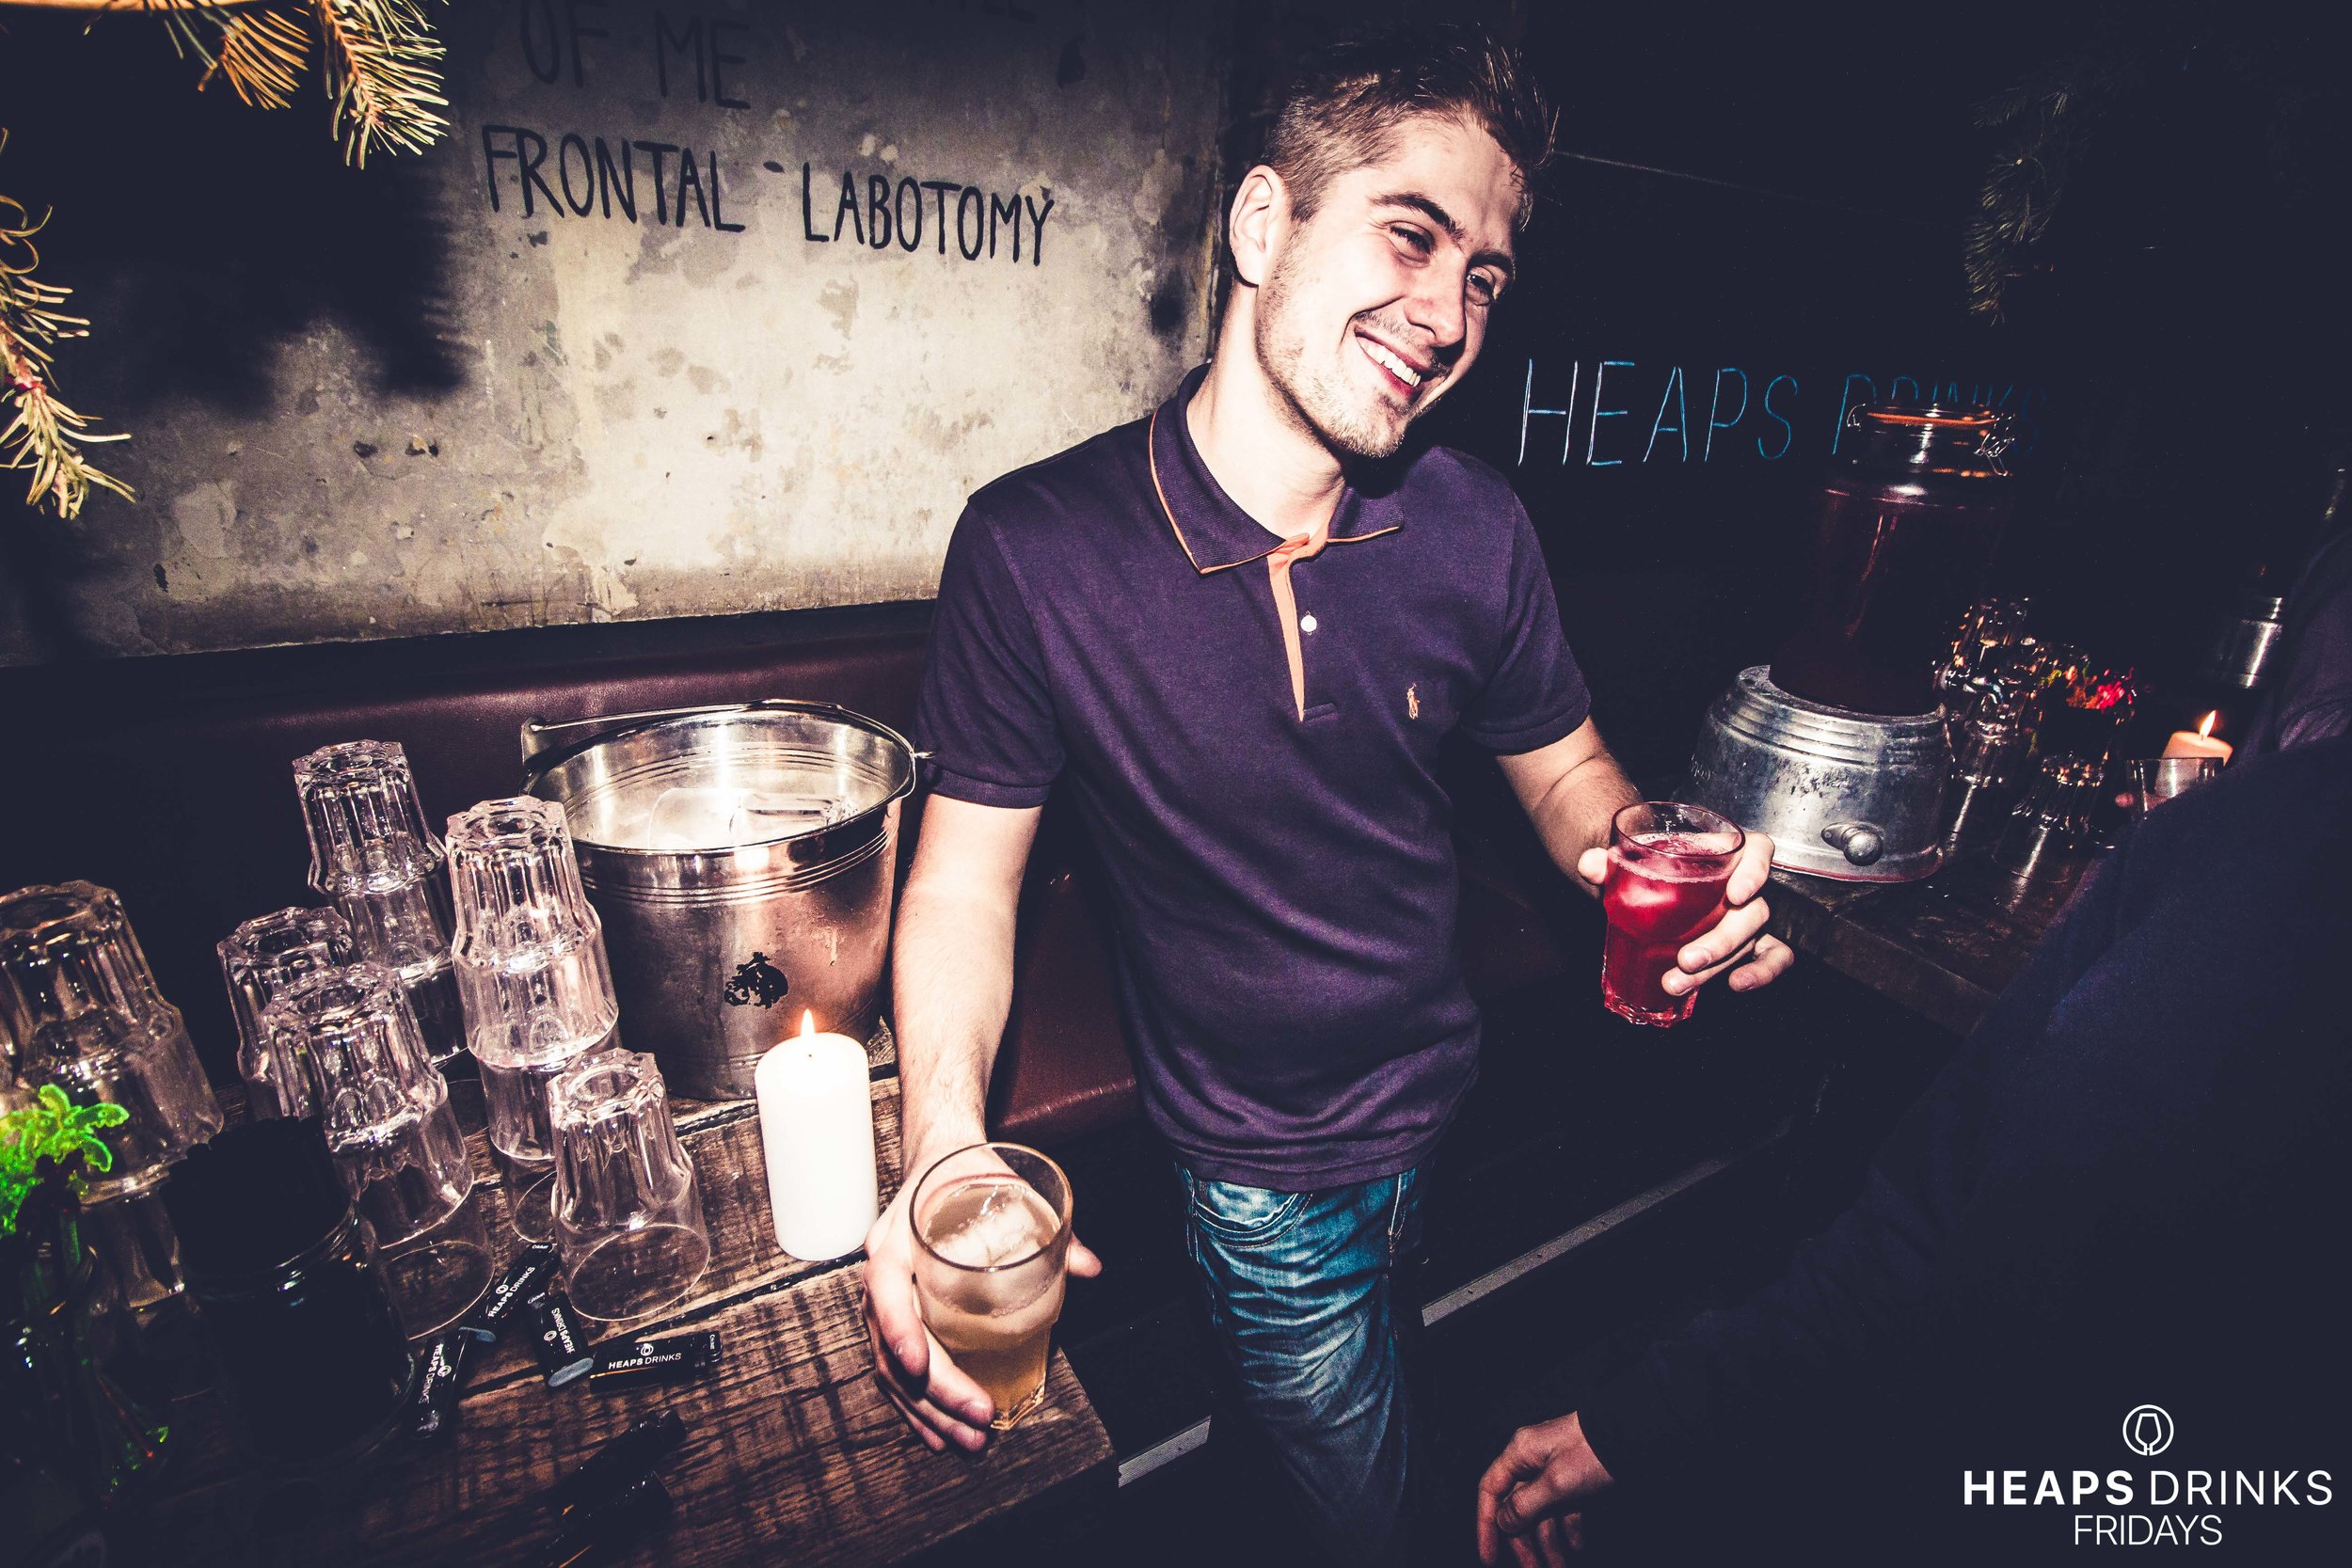 Heaps_drinks_60.jpg